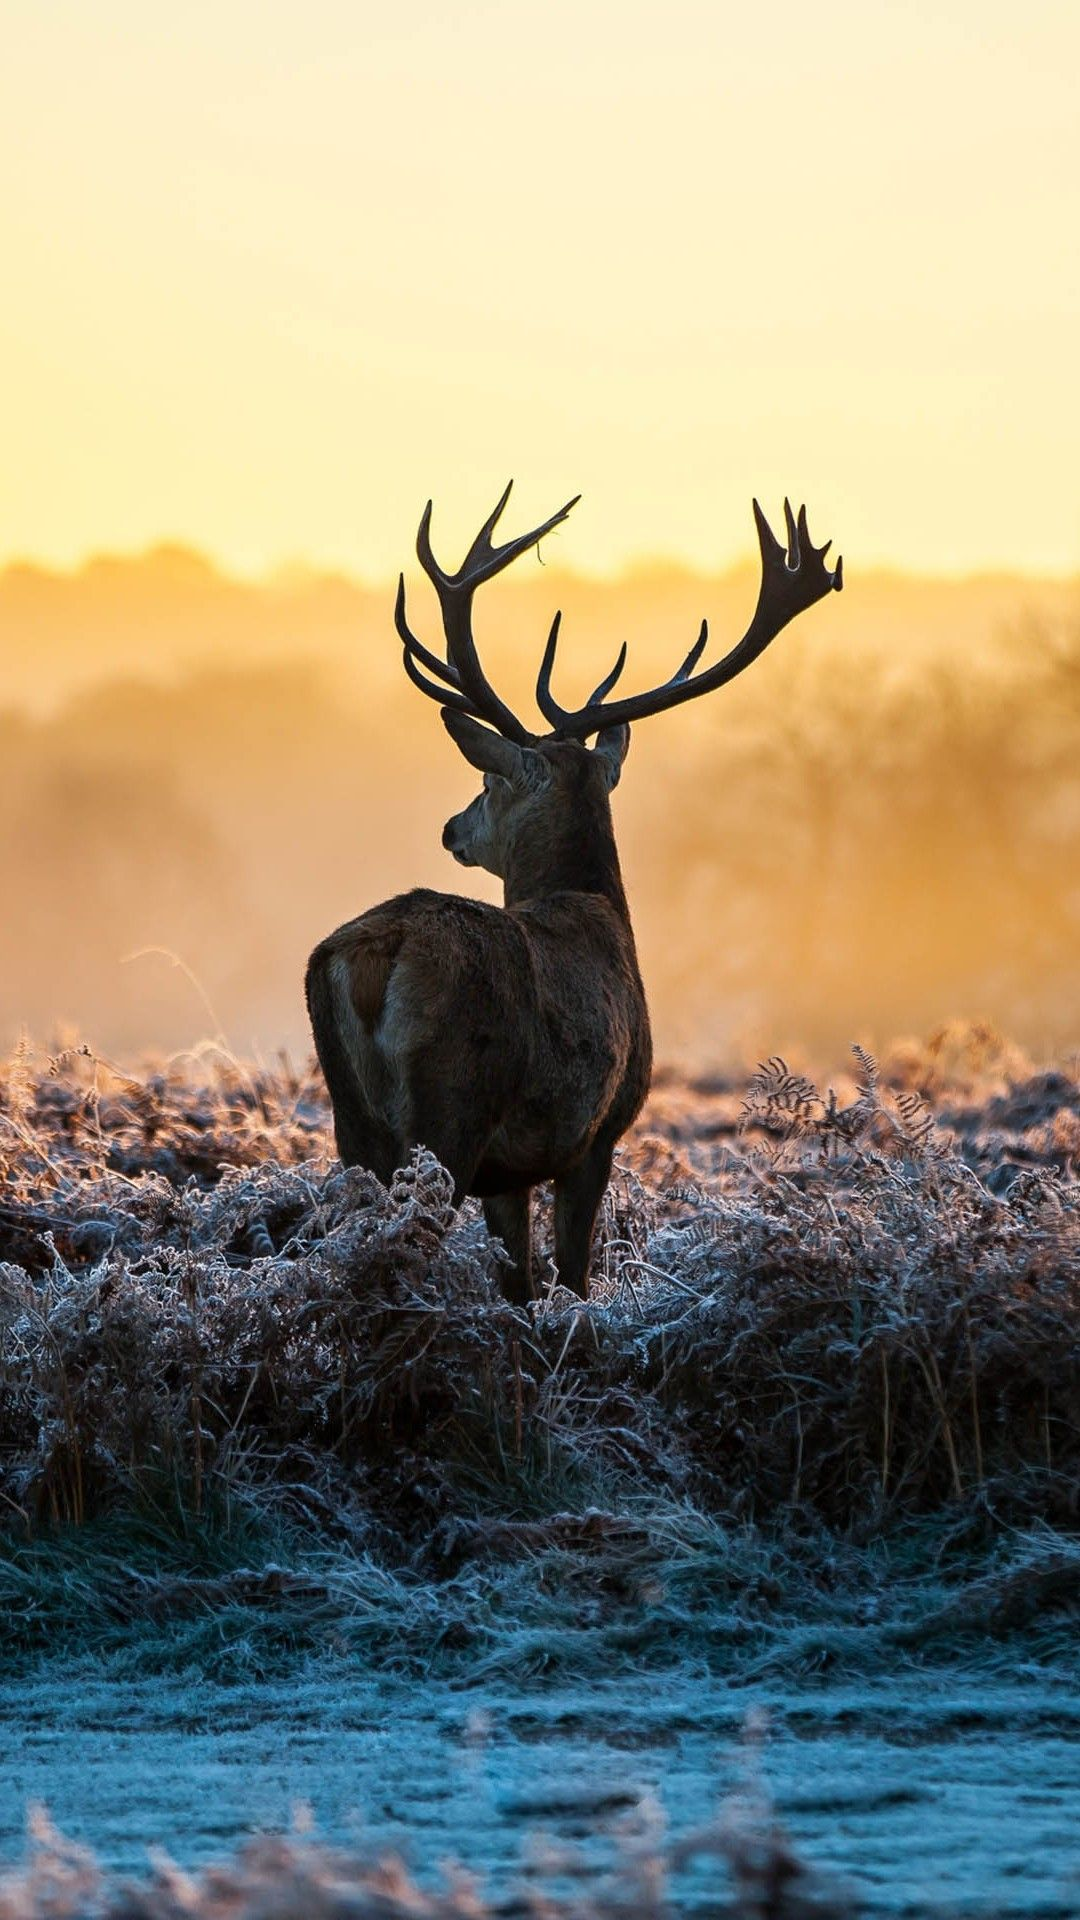 Reindeer Wallpaper Ausgestopftes Tier Susseste Haustiere Tiere Wild